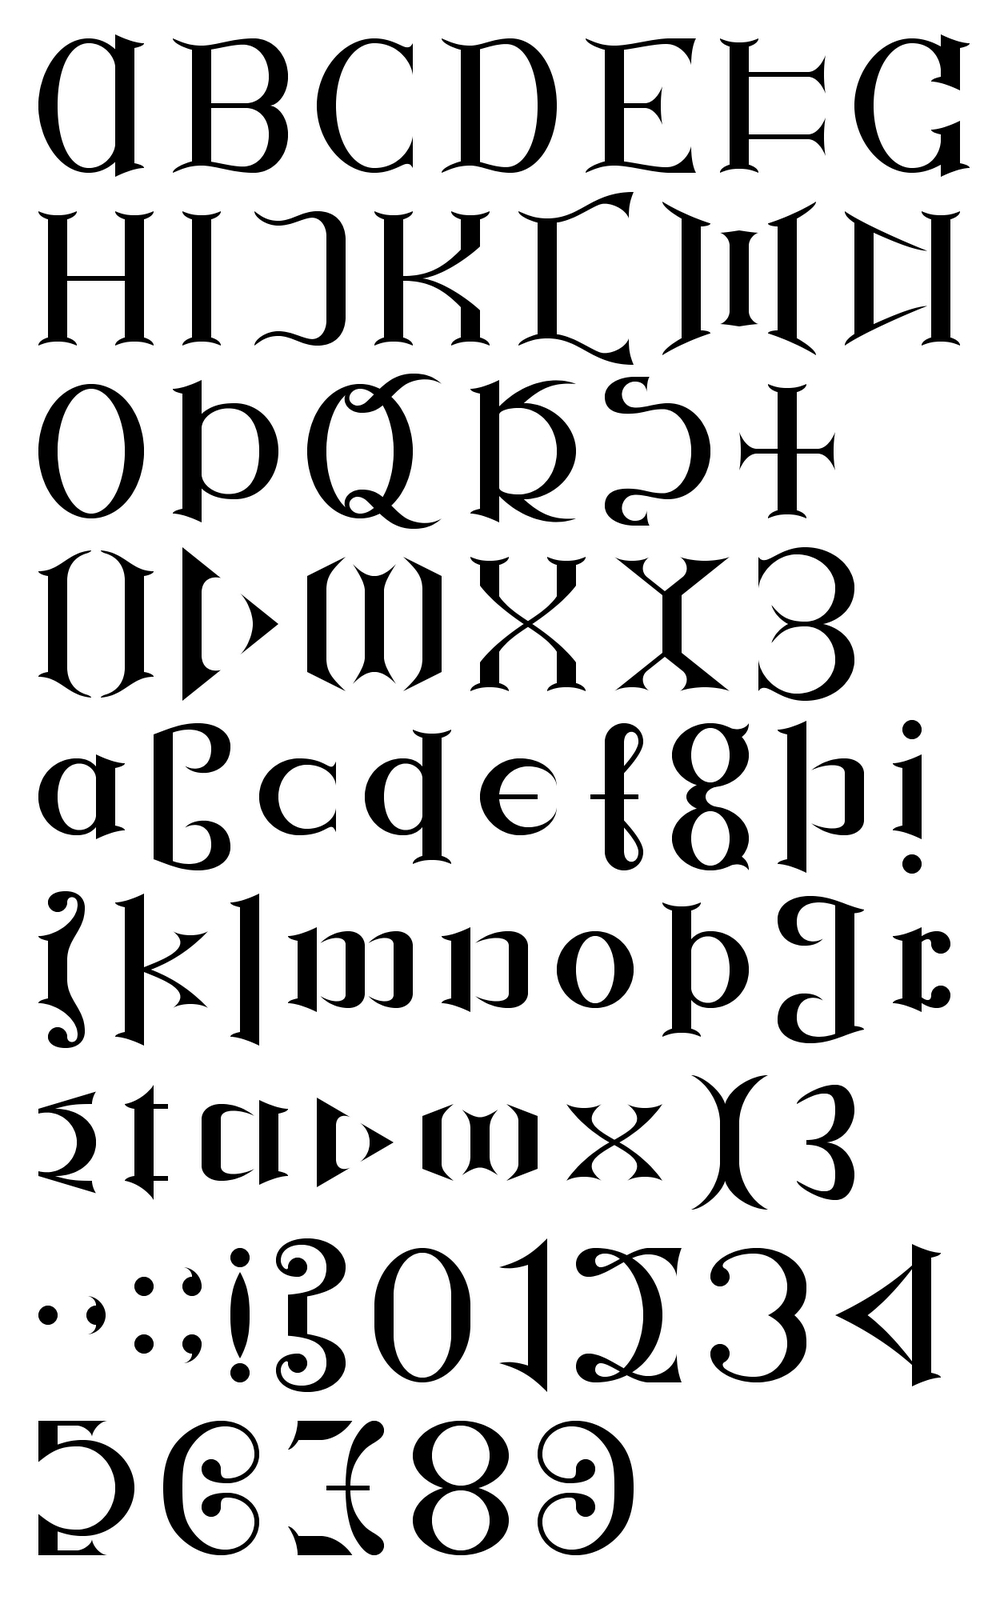 Ambigram Font | Graphic Design: Ambigrams | Tattoo Fonts, Ambigram - Ambigram Generator Free Printable